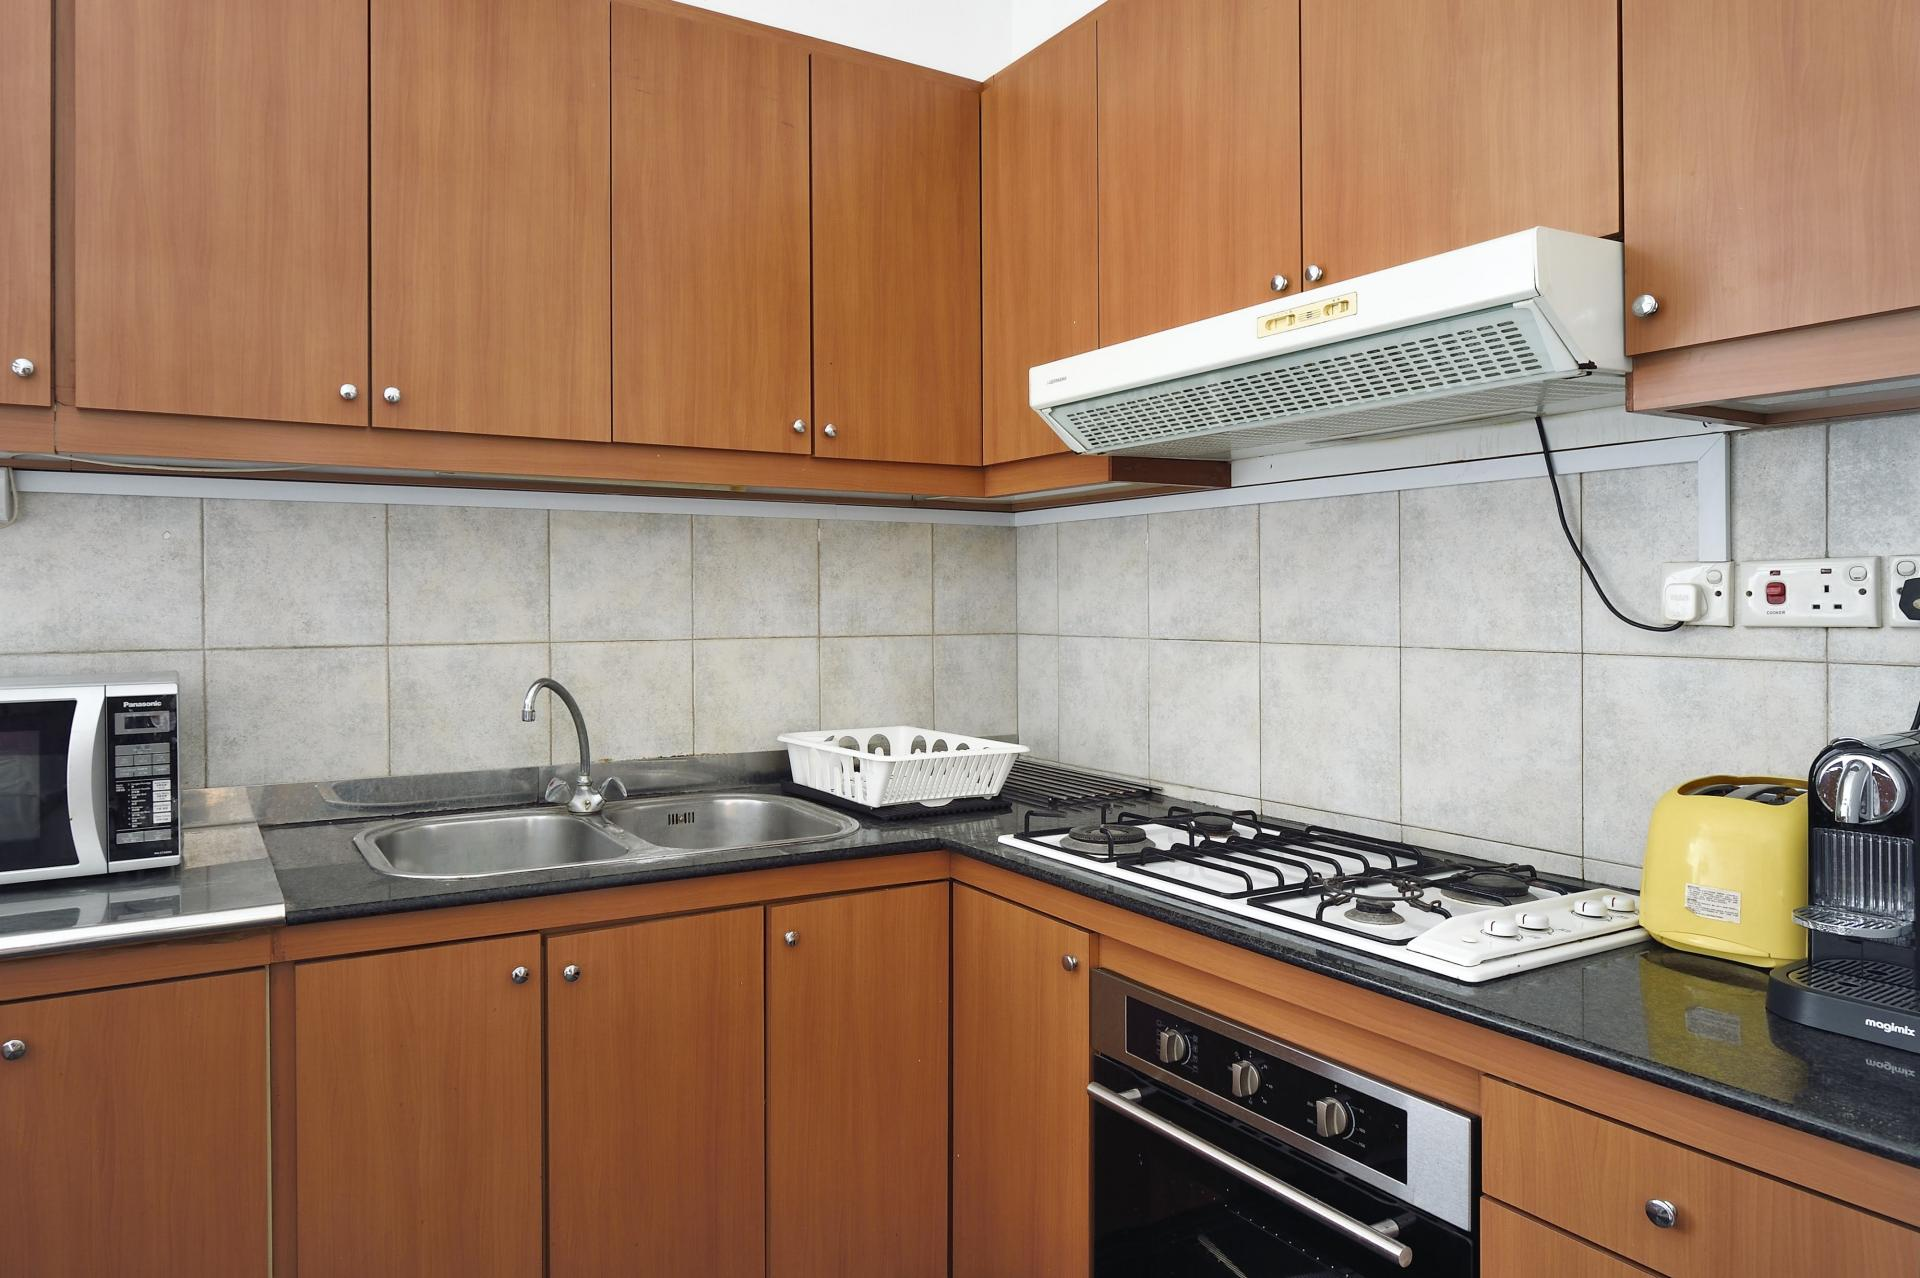 Kitchen at Cavenagh House Apartments, Kallang, Singapore